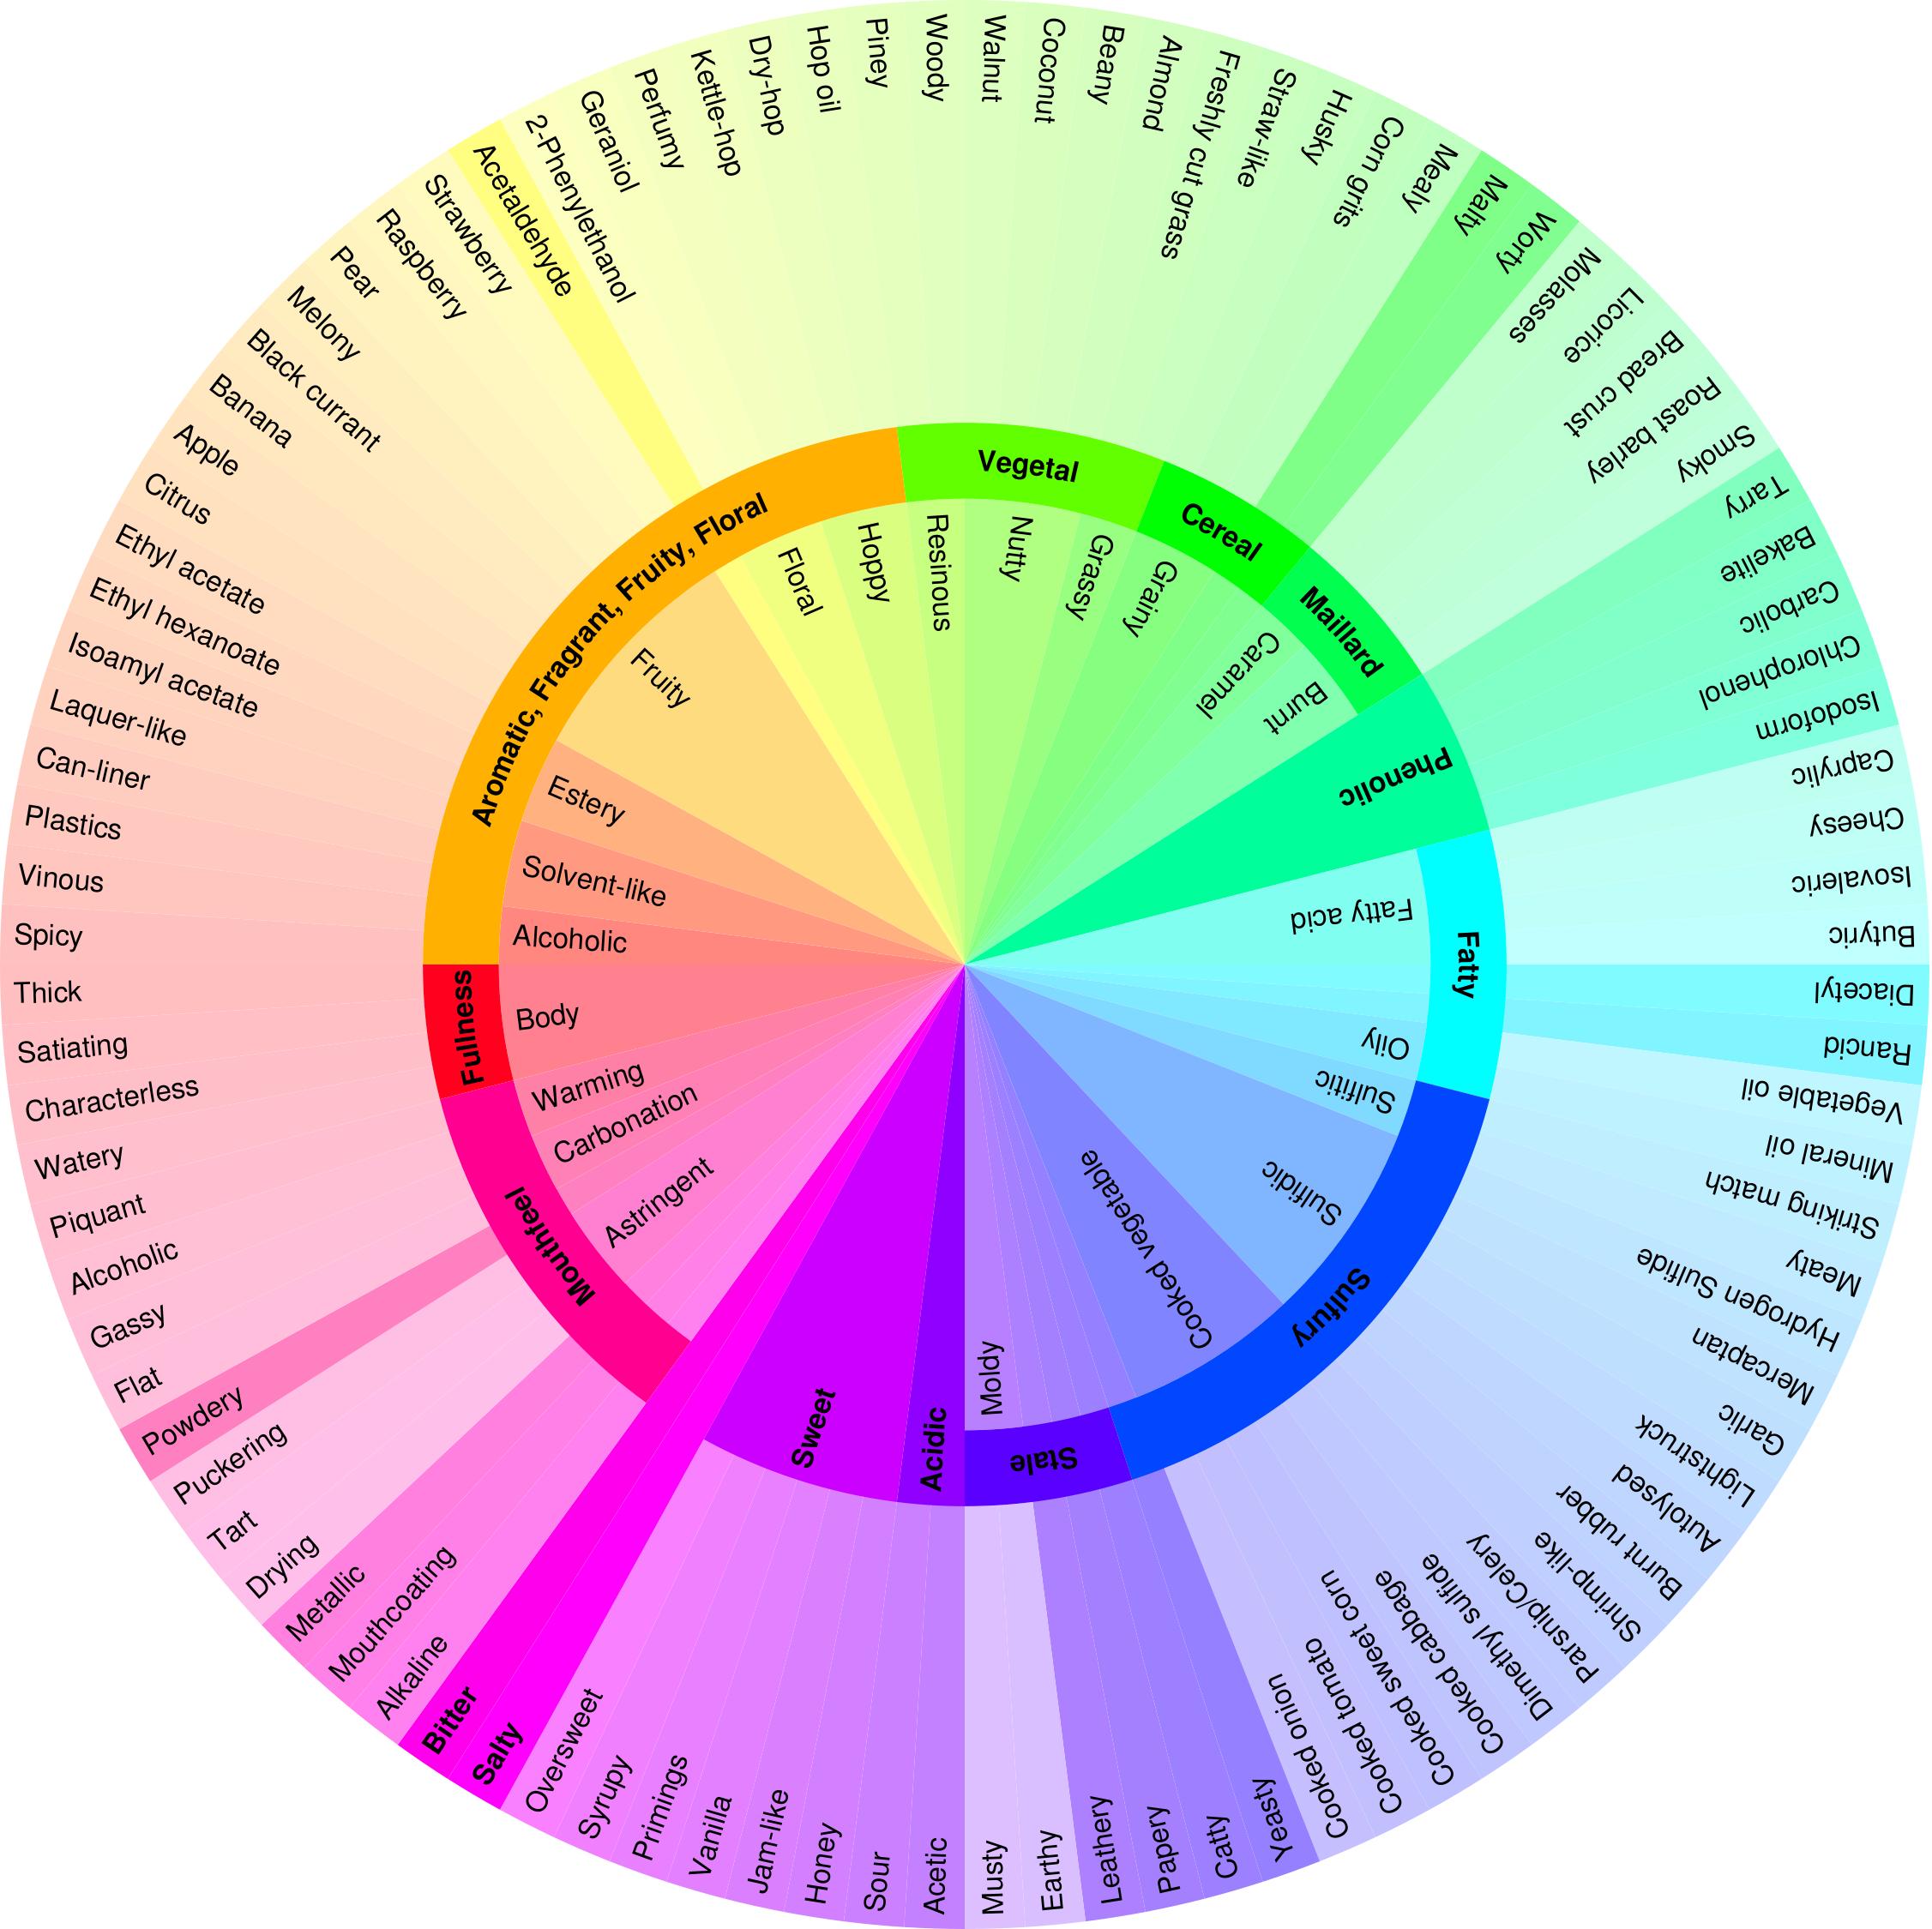 beer-aroma-wheel